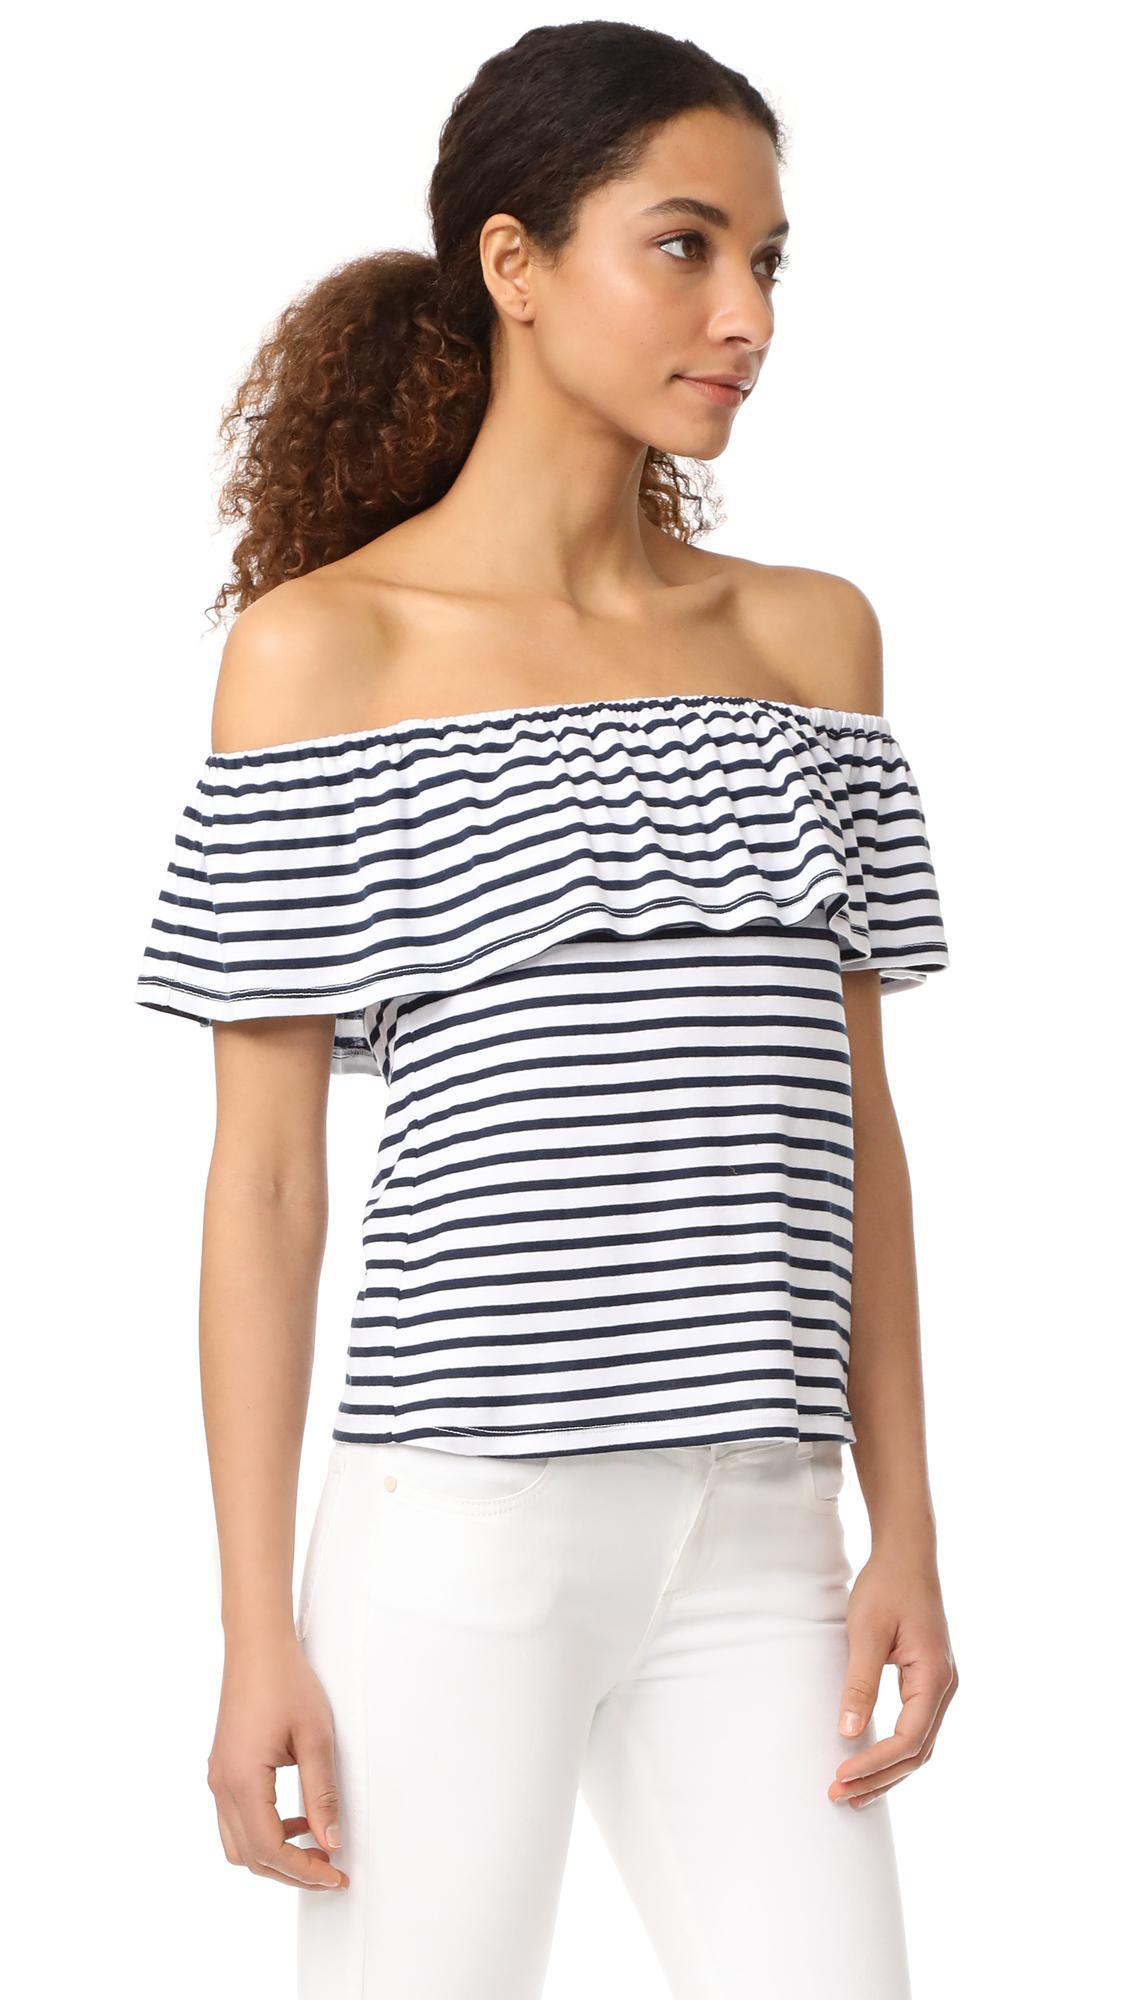 28673555951 Splendid 1x1 Venice Stripe Off Shoulder Top in White - Lyst